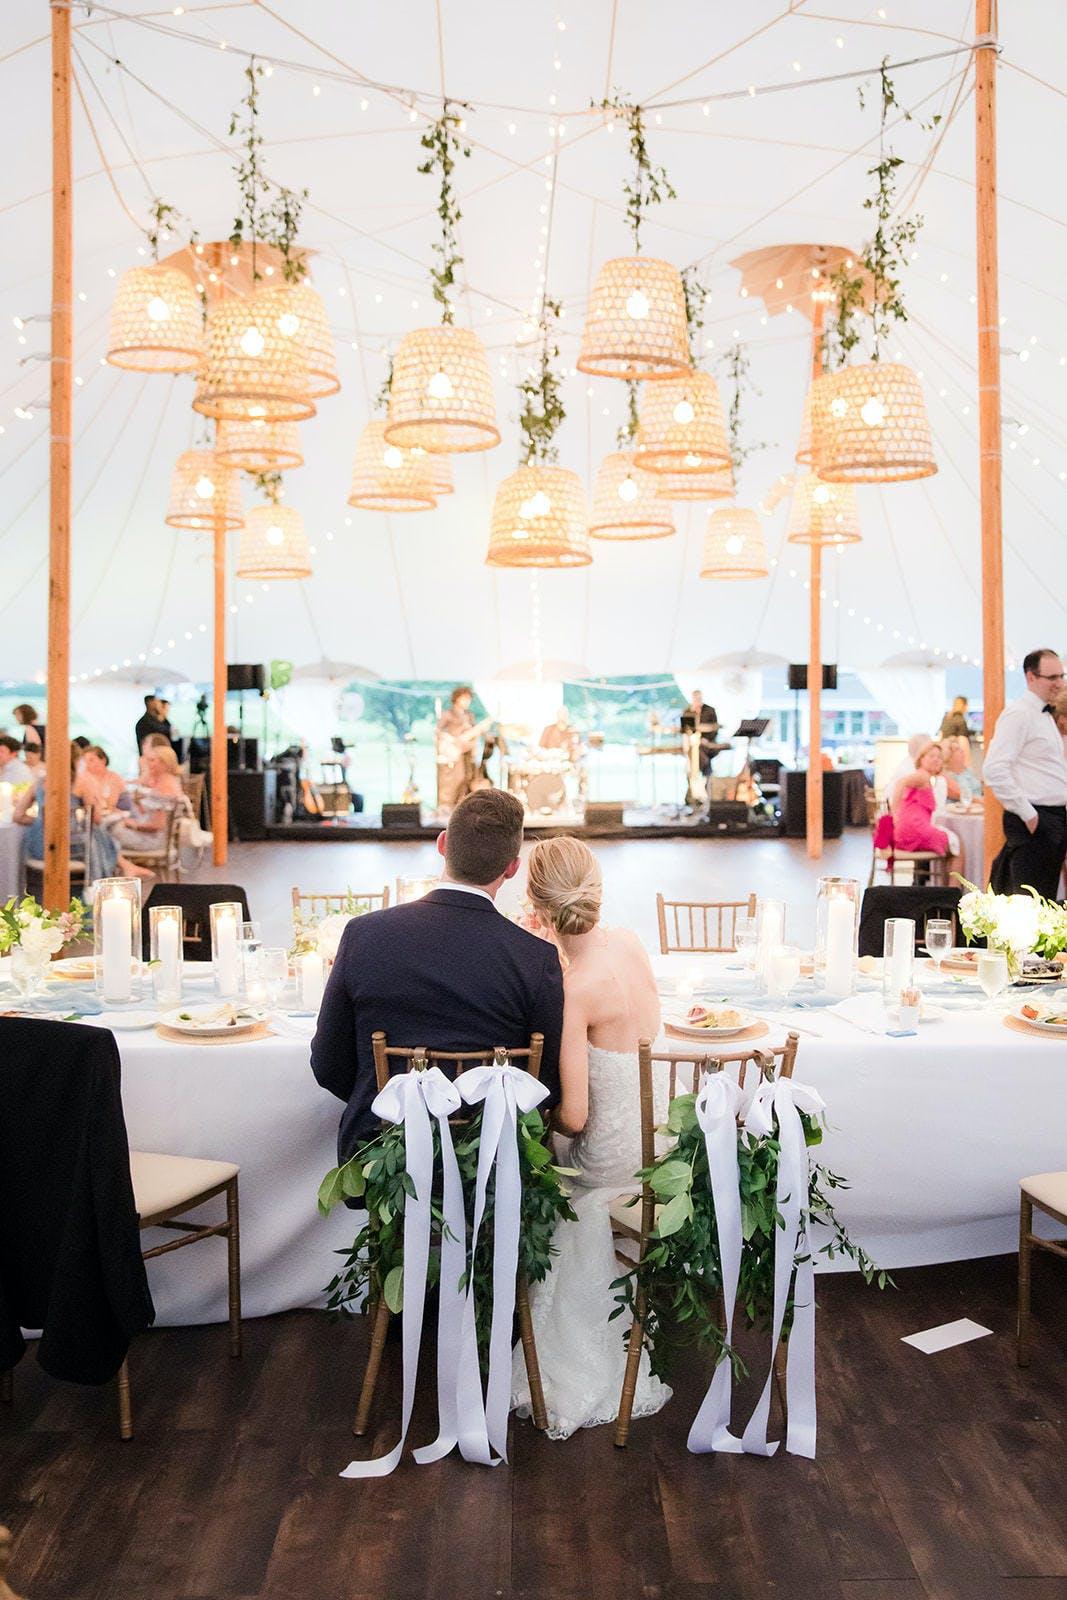 Charming Boho Summer Wedding at Spring Lake Golf Club in New Jersey